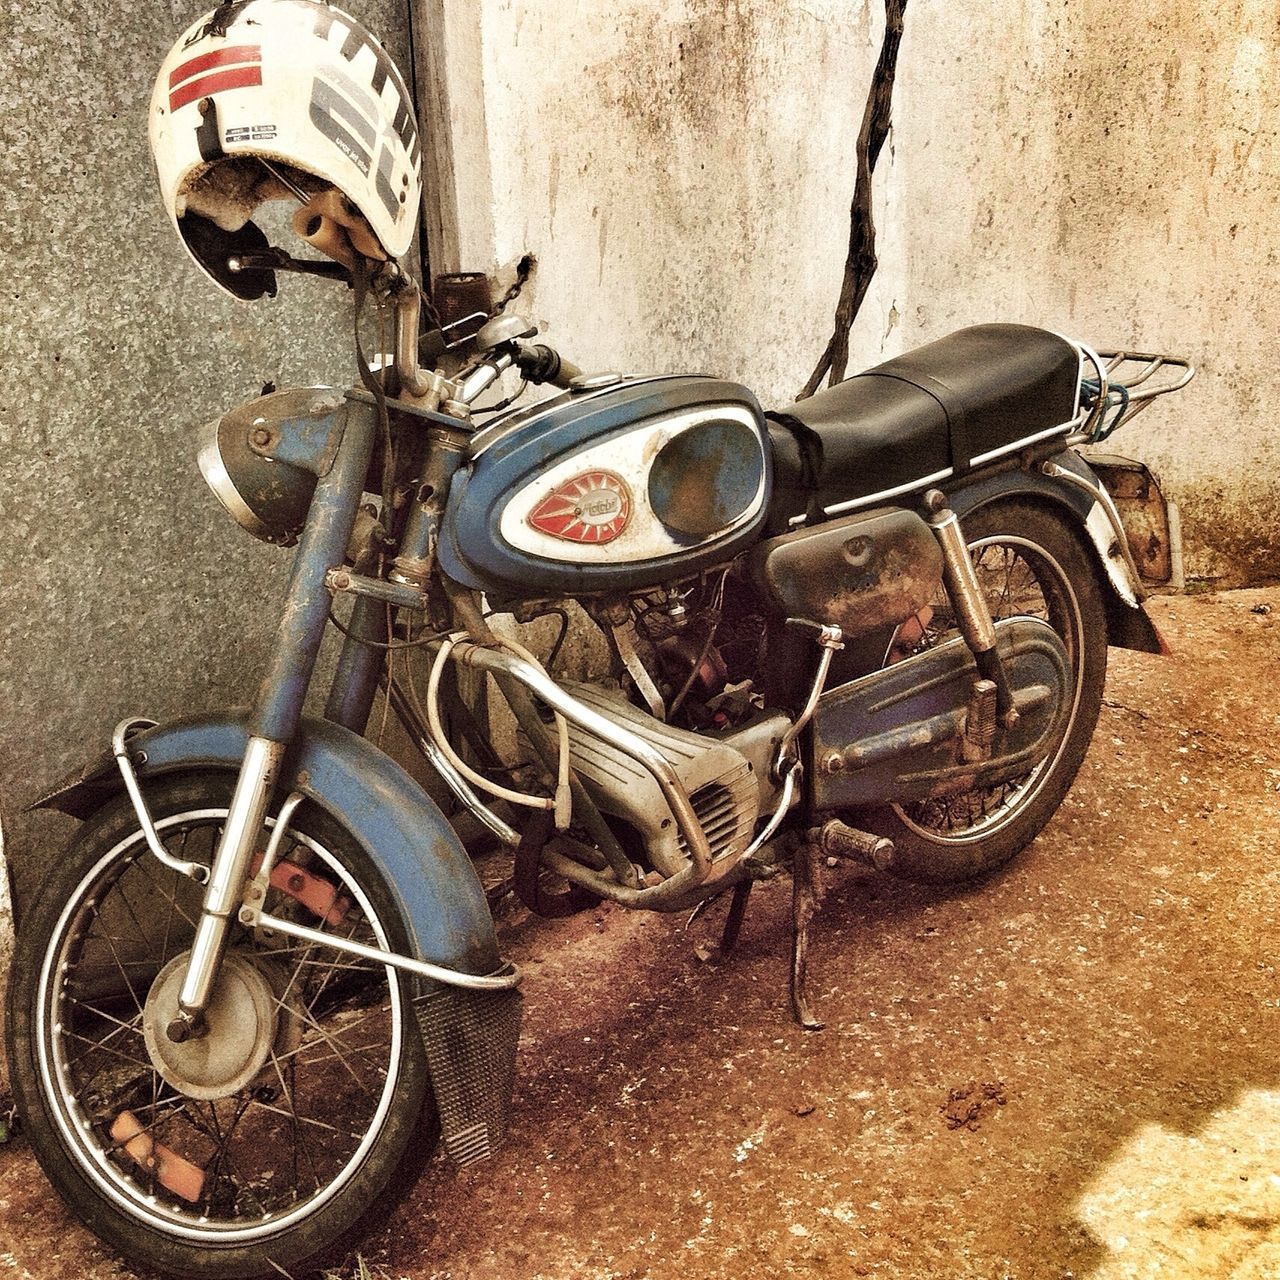 Beautiful stock photos of motorcycle, Auto Post Production Filter, Day, Faro, Helmet